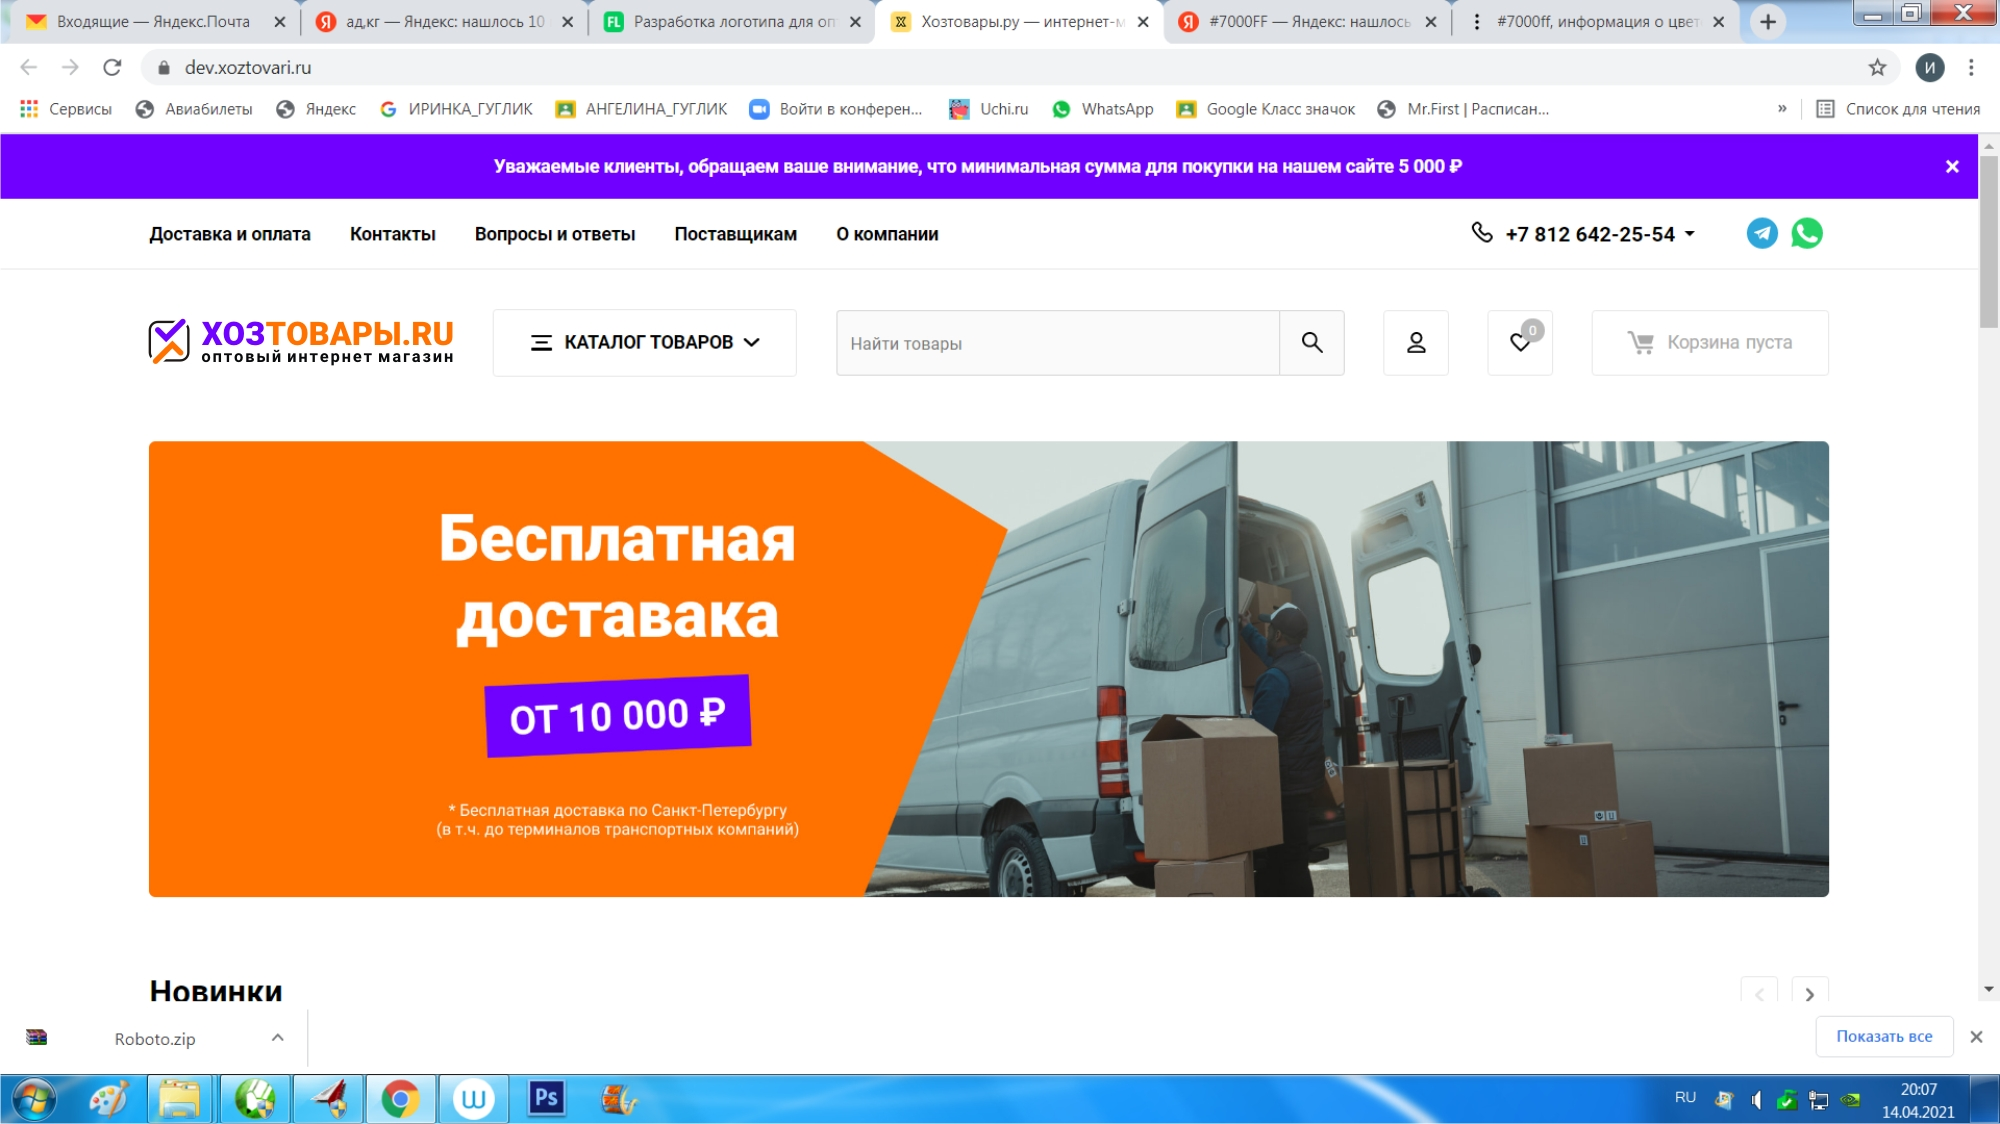 Разработка логотипа для оптового интернет-магазина «Хозтовары.ру» фото f_0456077060127466.jpg